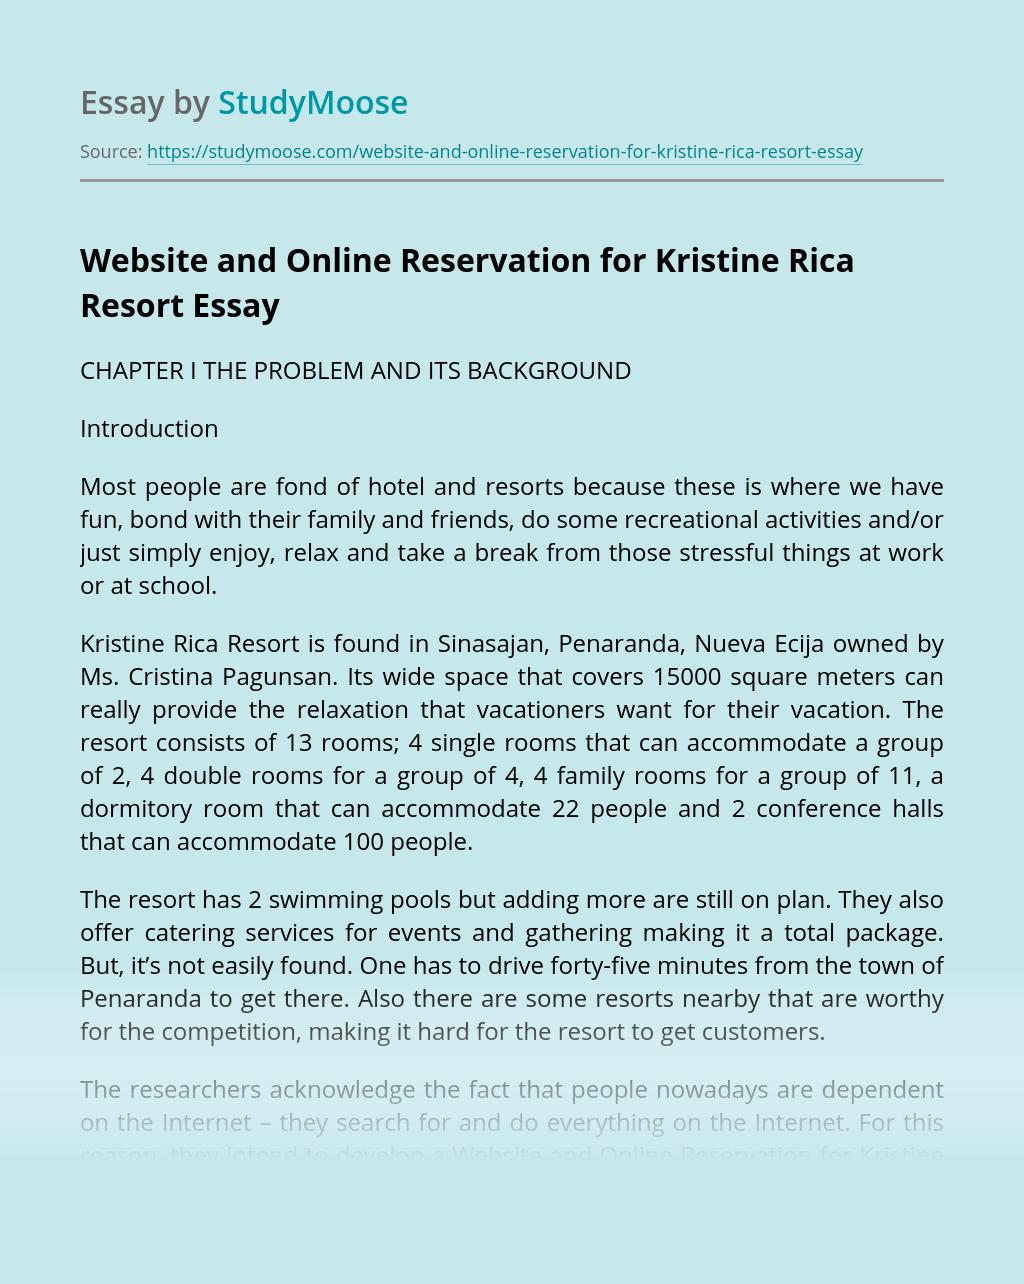 Website and Online Reservation for Kristine Rica Resort